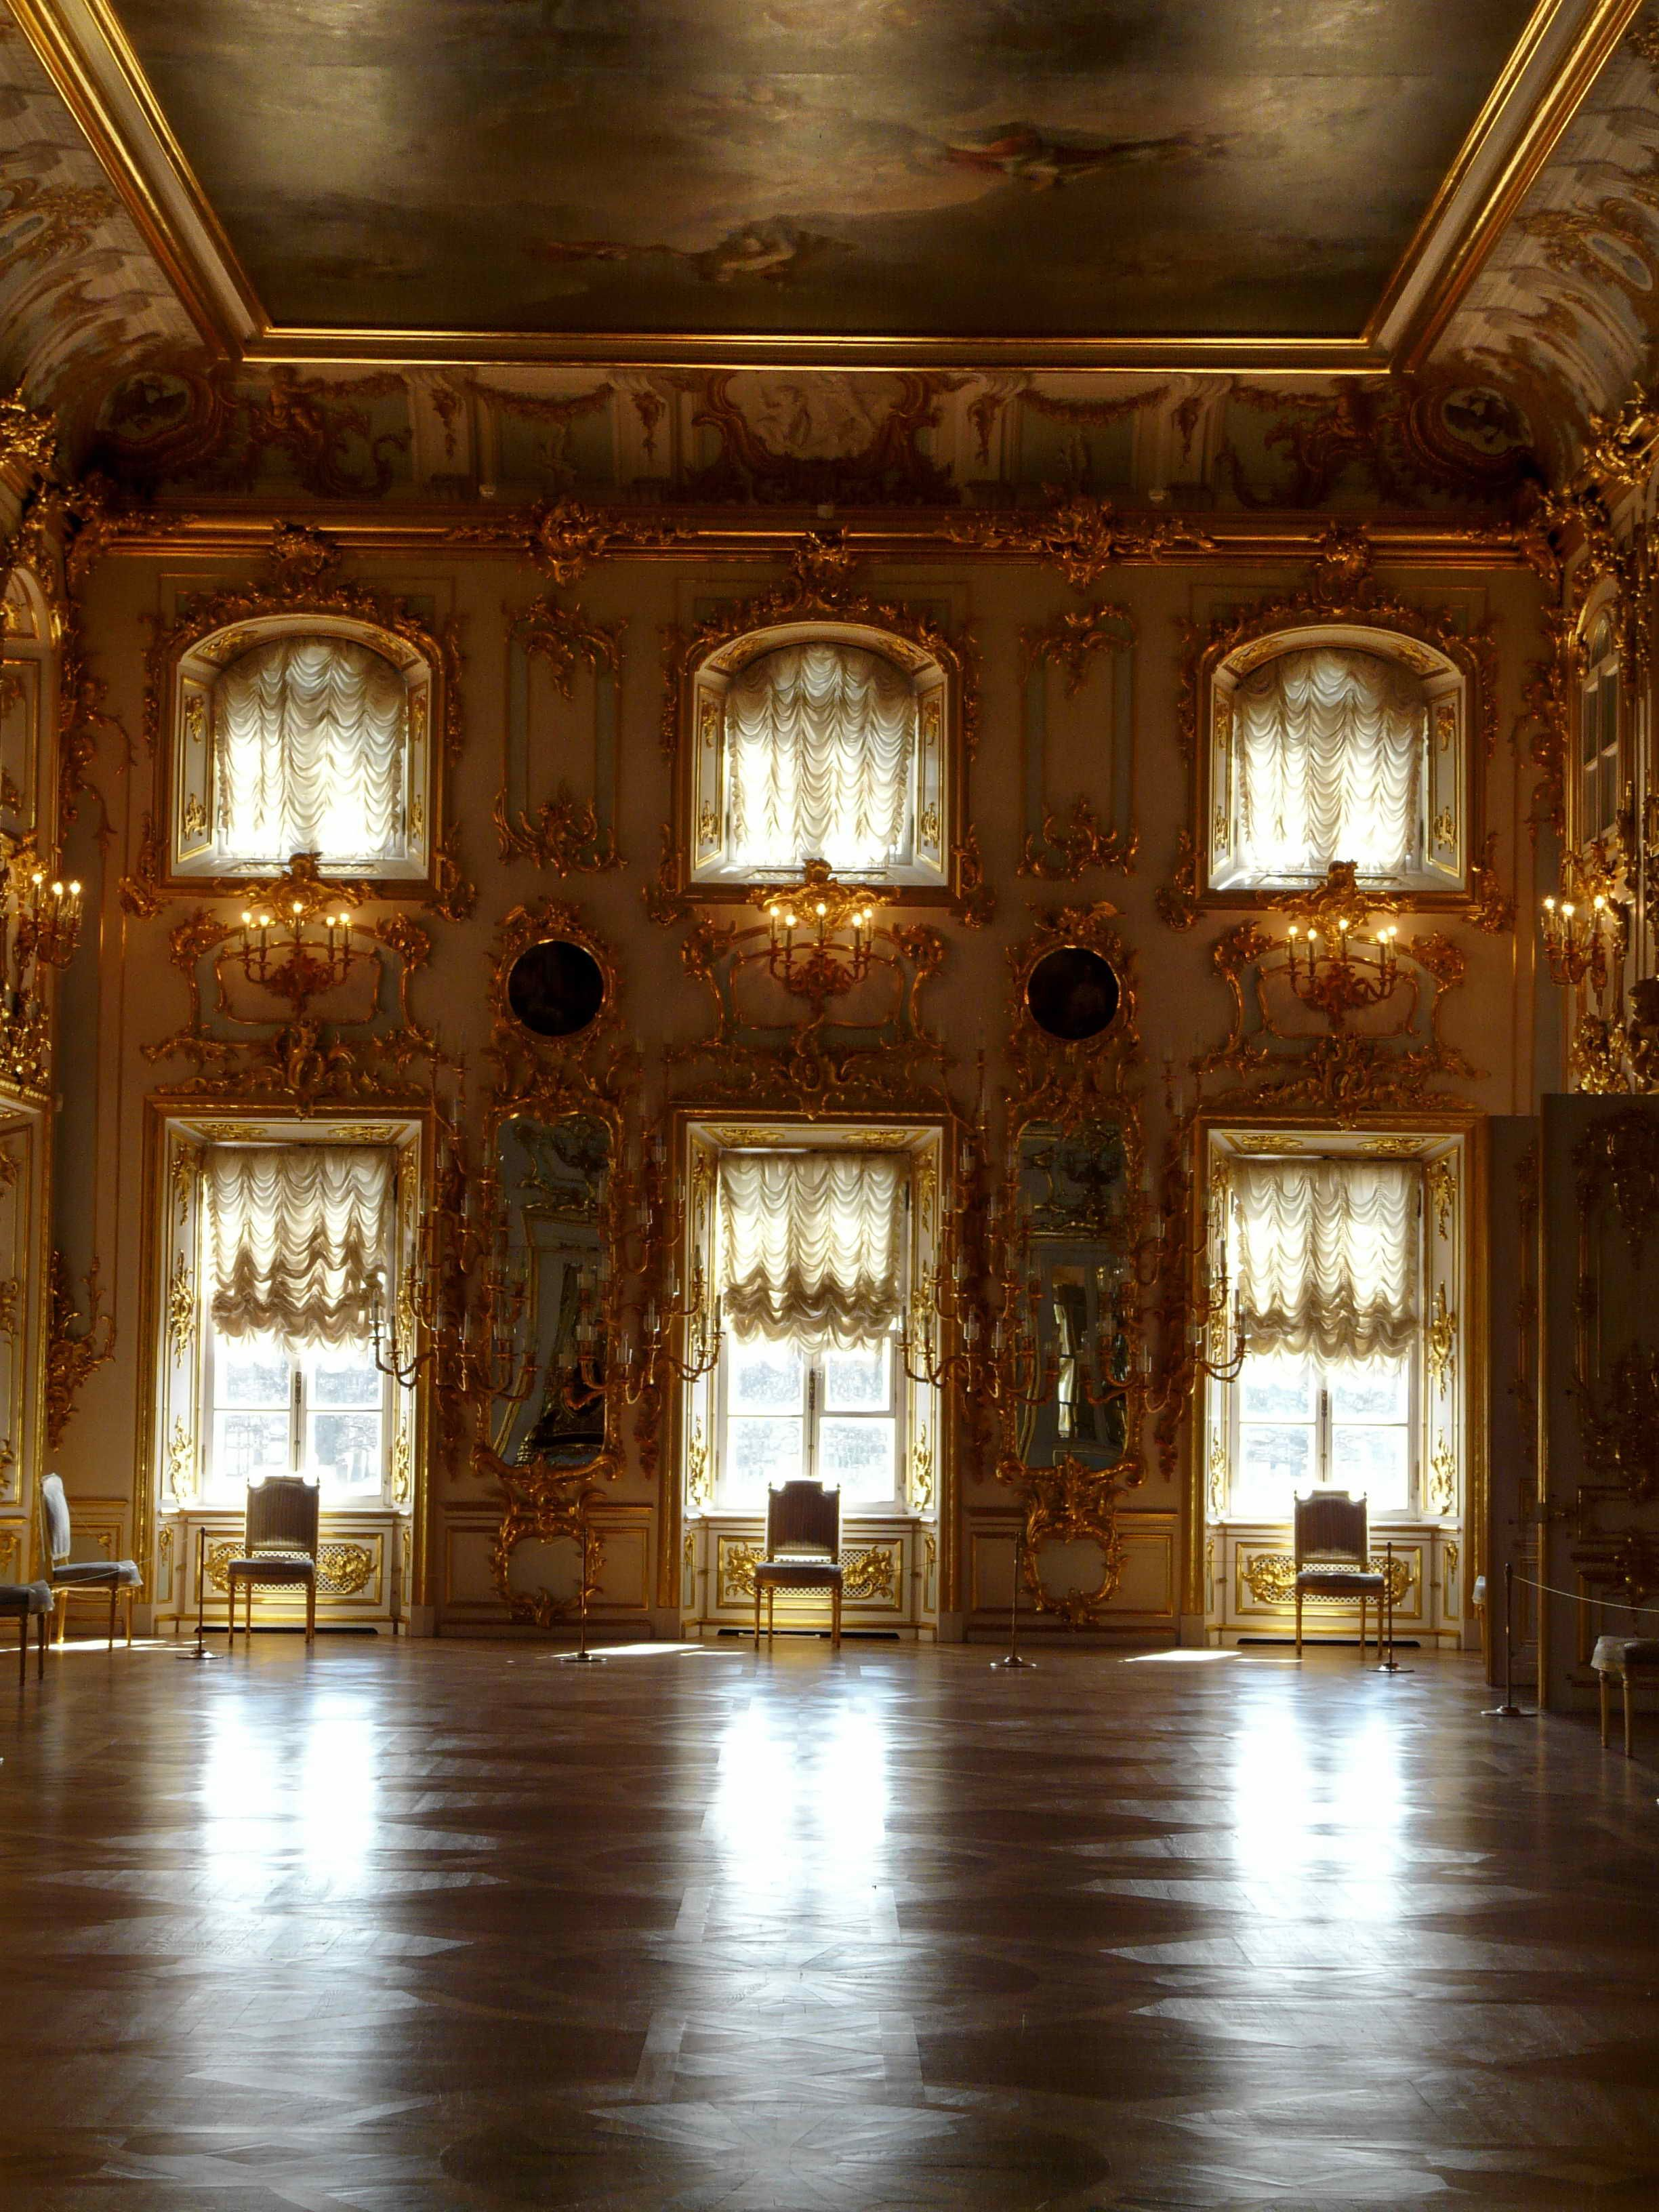 Interior of the Peterhof Palace